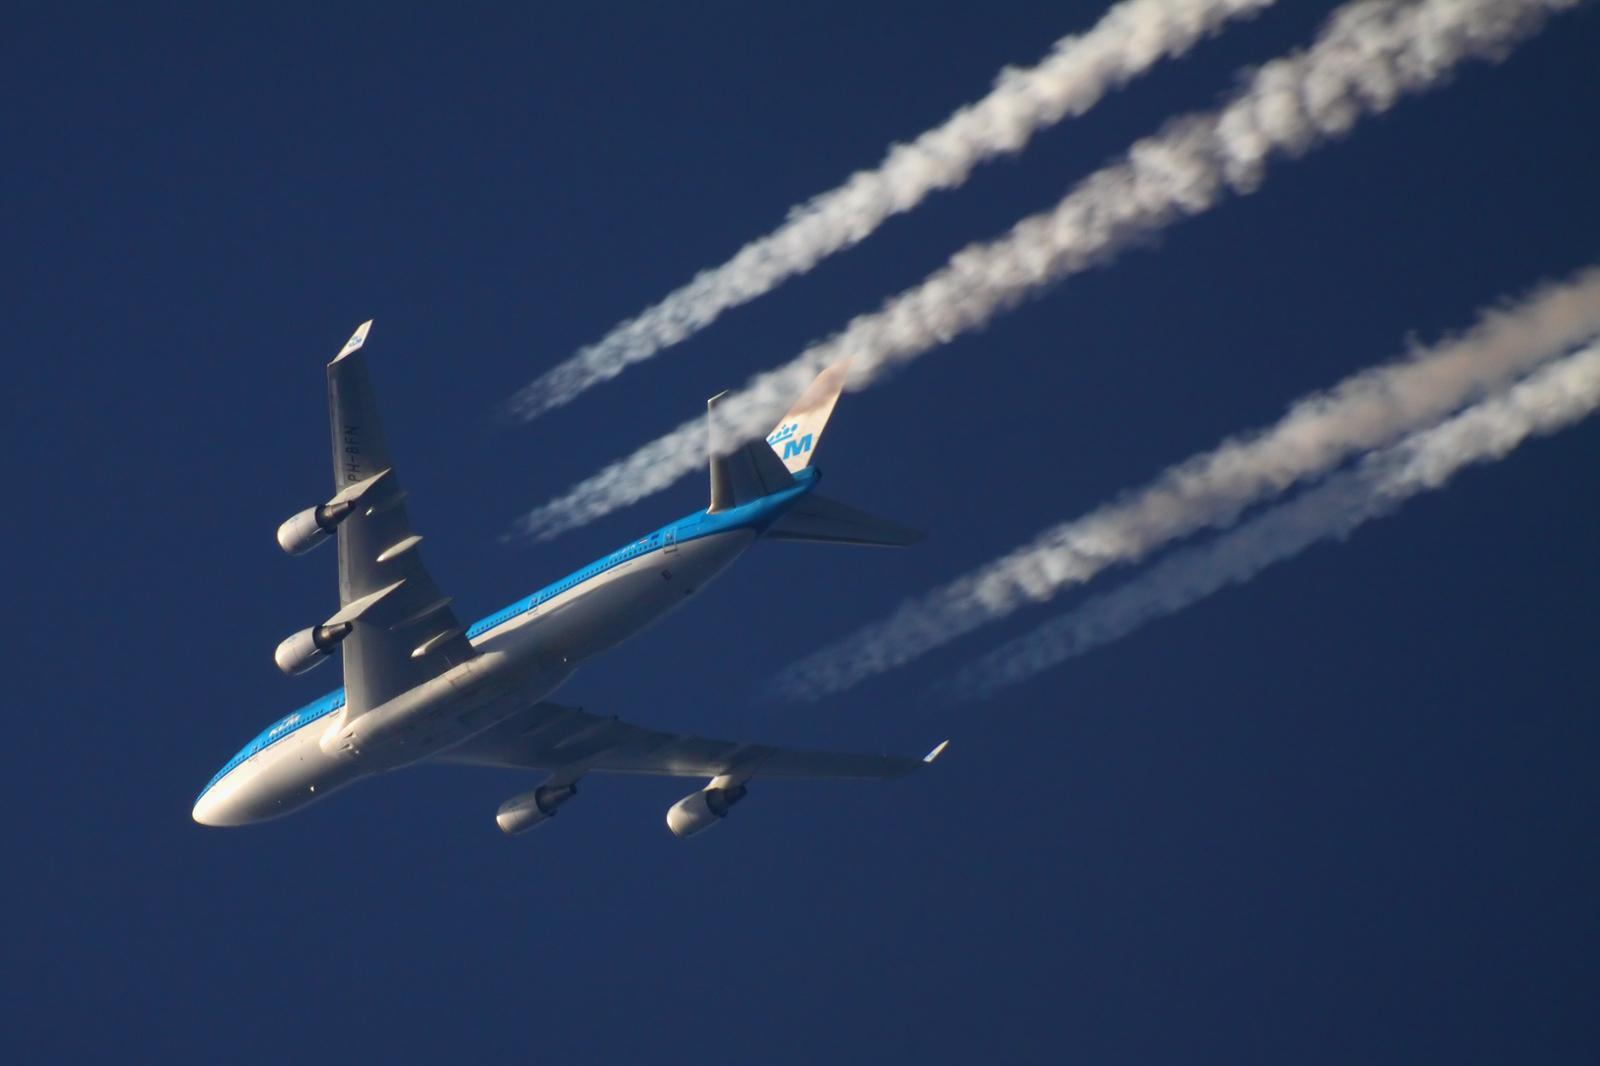 Contrails_of_KLM_Boeing_747-400_over_Khimki_22-Oct-2011